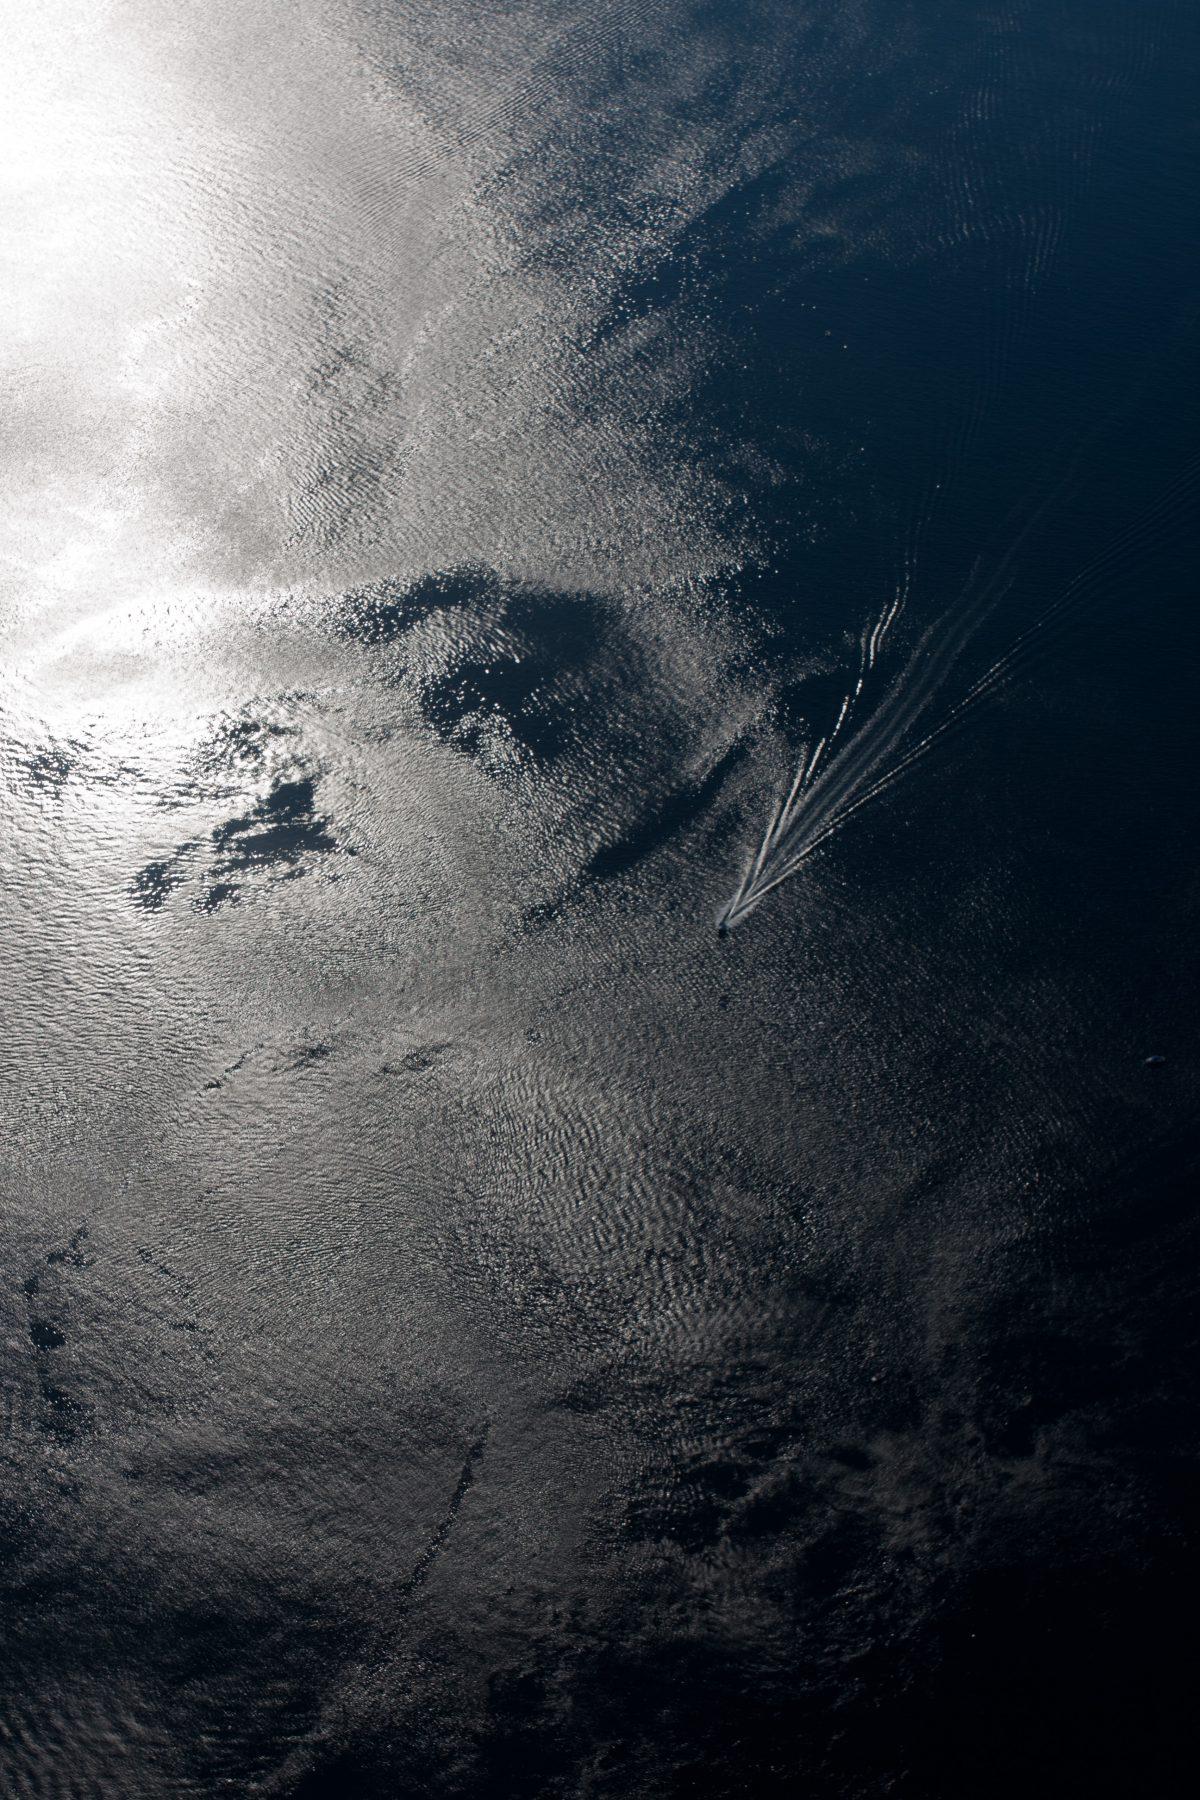 sea, water, seaplane